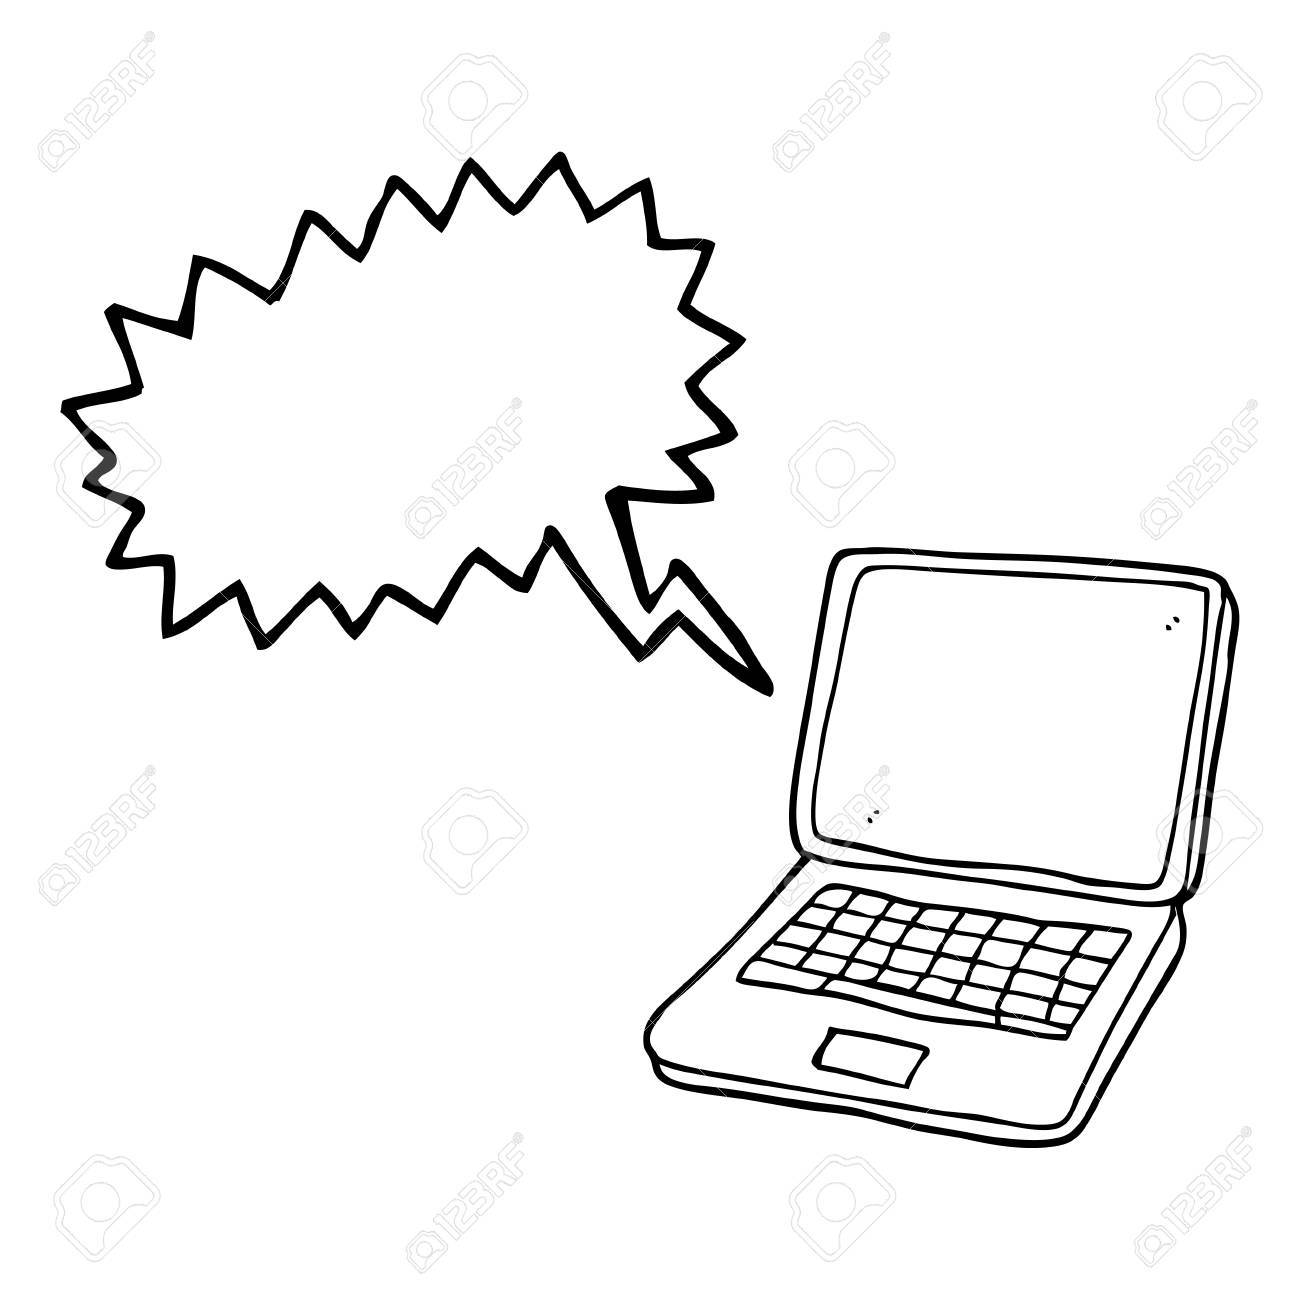 Freehand drawn speech bubble cartoon laptop computer with heart freehand drawn speech bubble cartoon laptop computer with heart symbol on screen stock vector 53101581 buycottarizona Choice Image